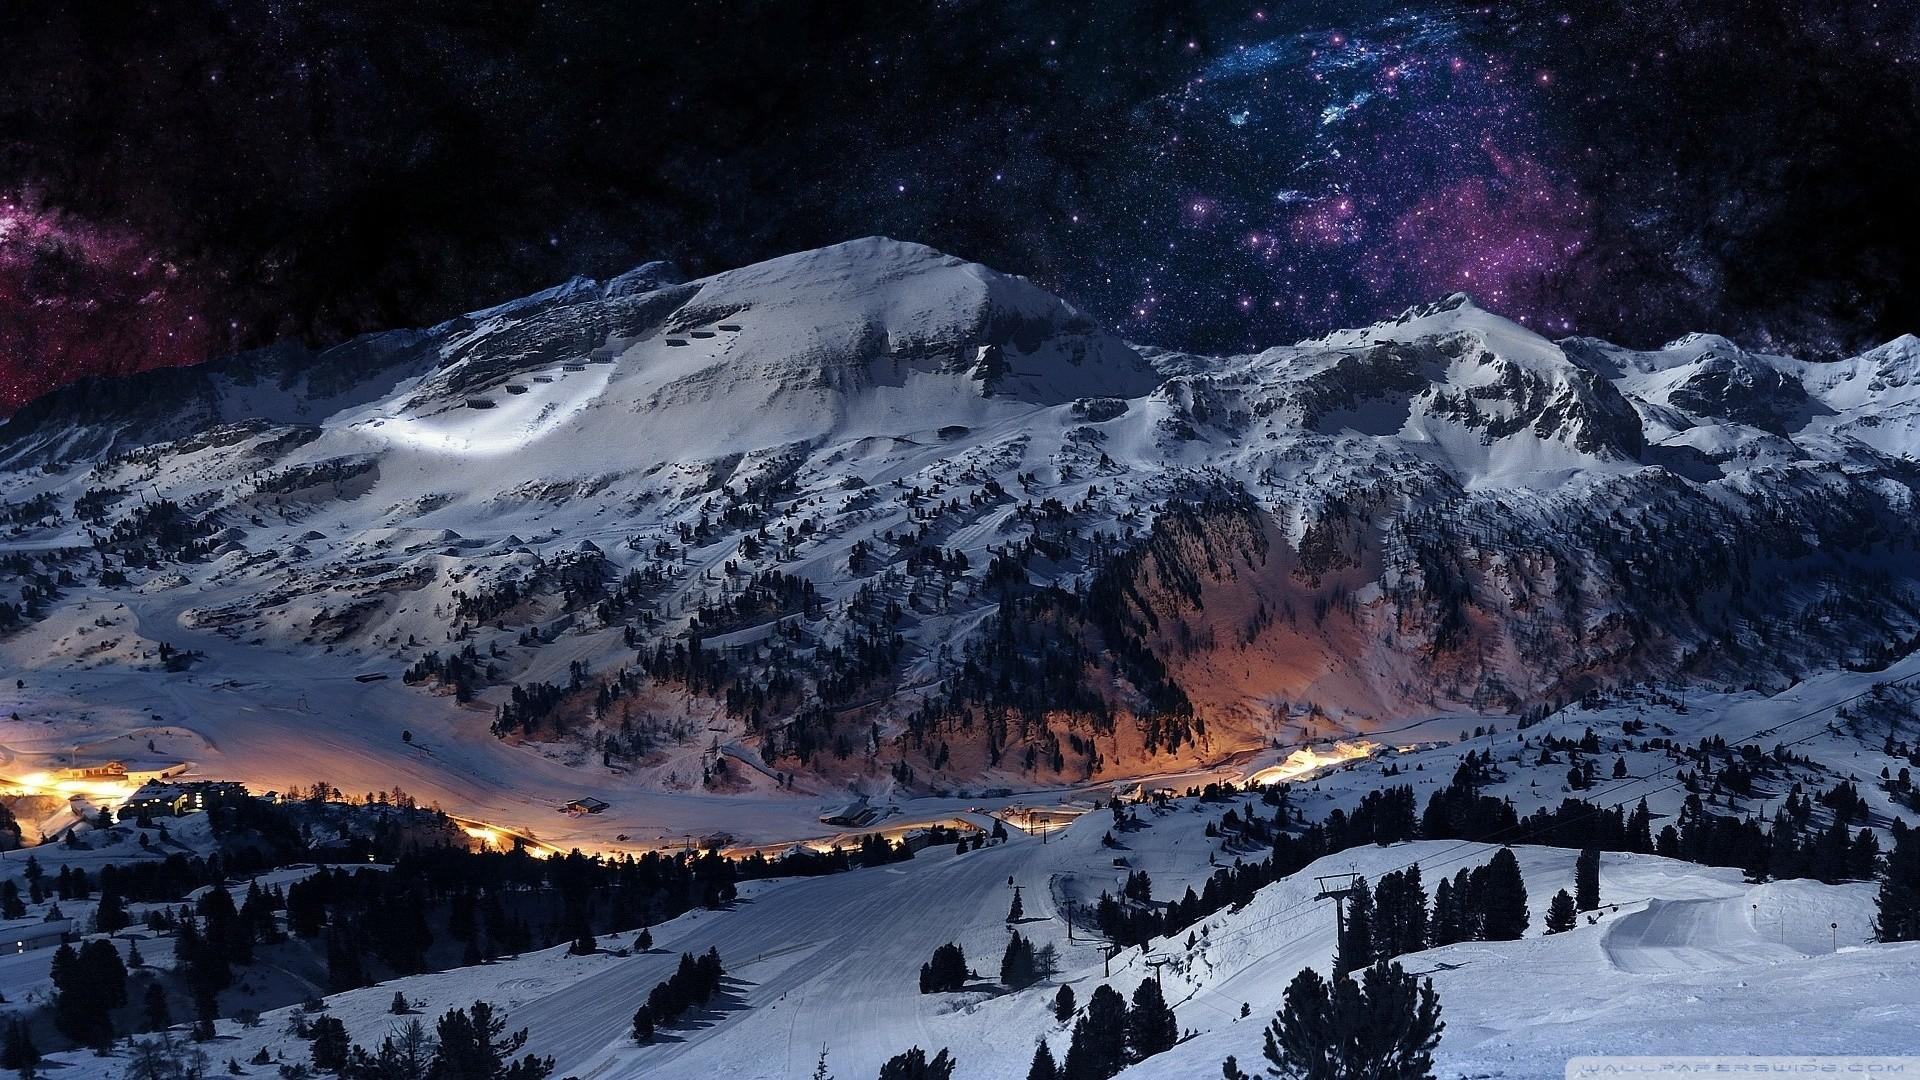 Night sky + snow [Wallpaper] | Reviews, news, tips, and tricks